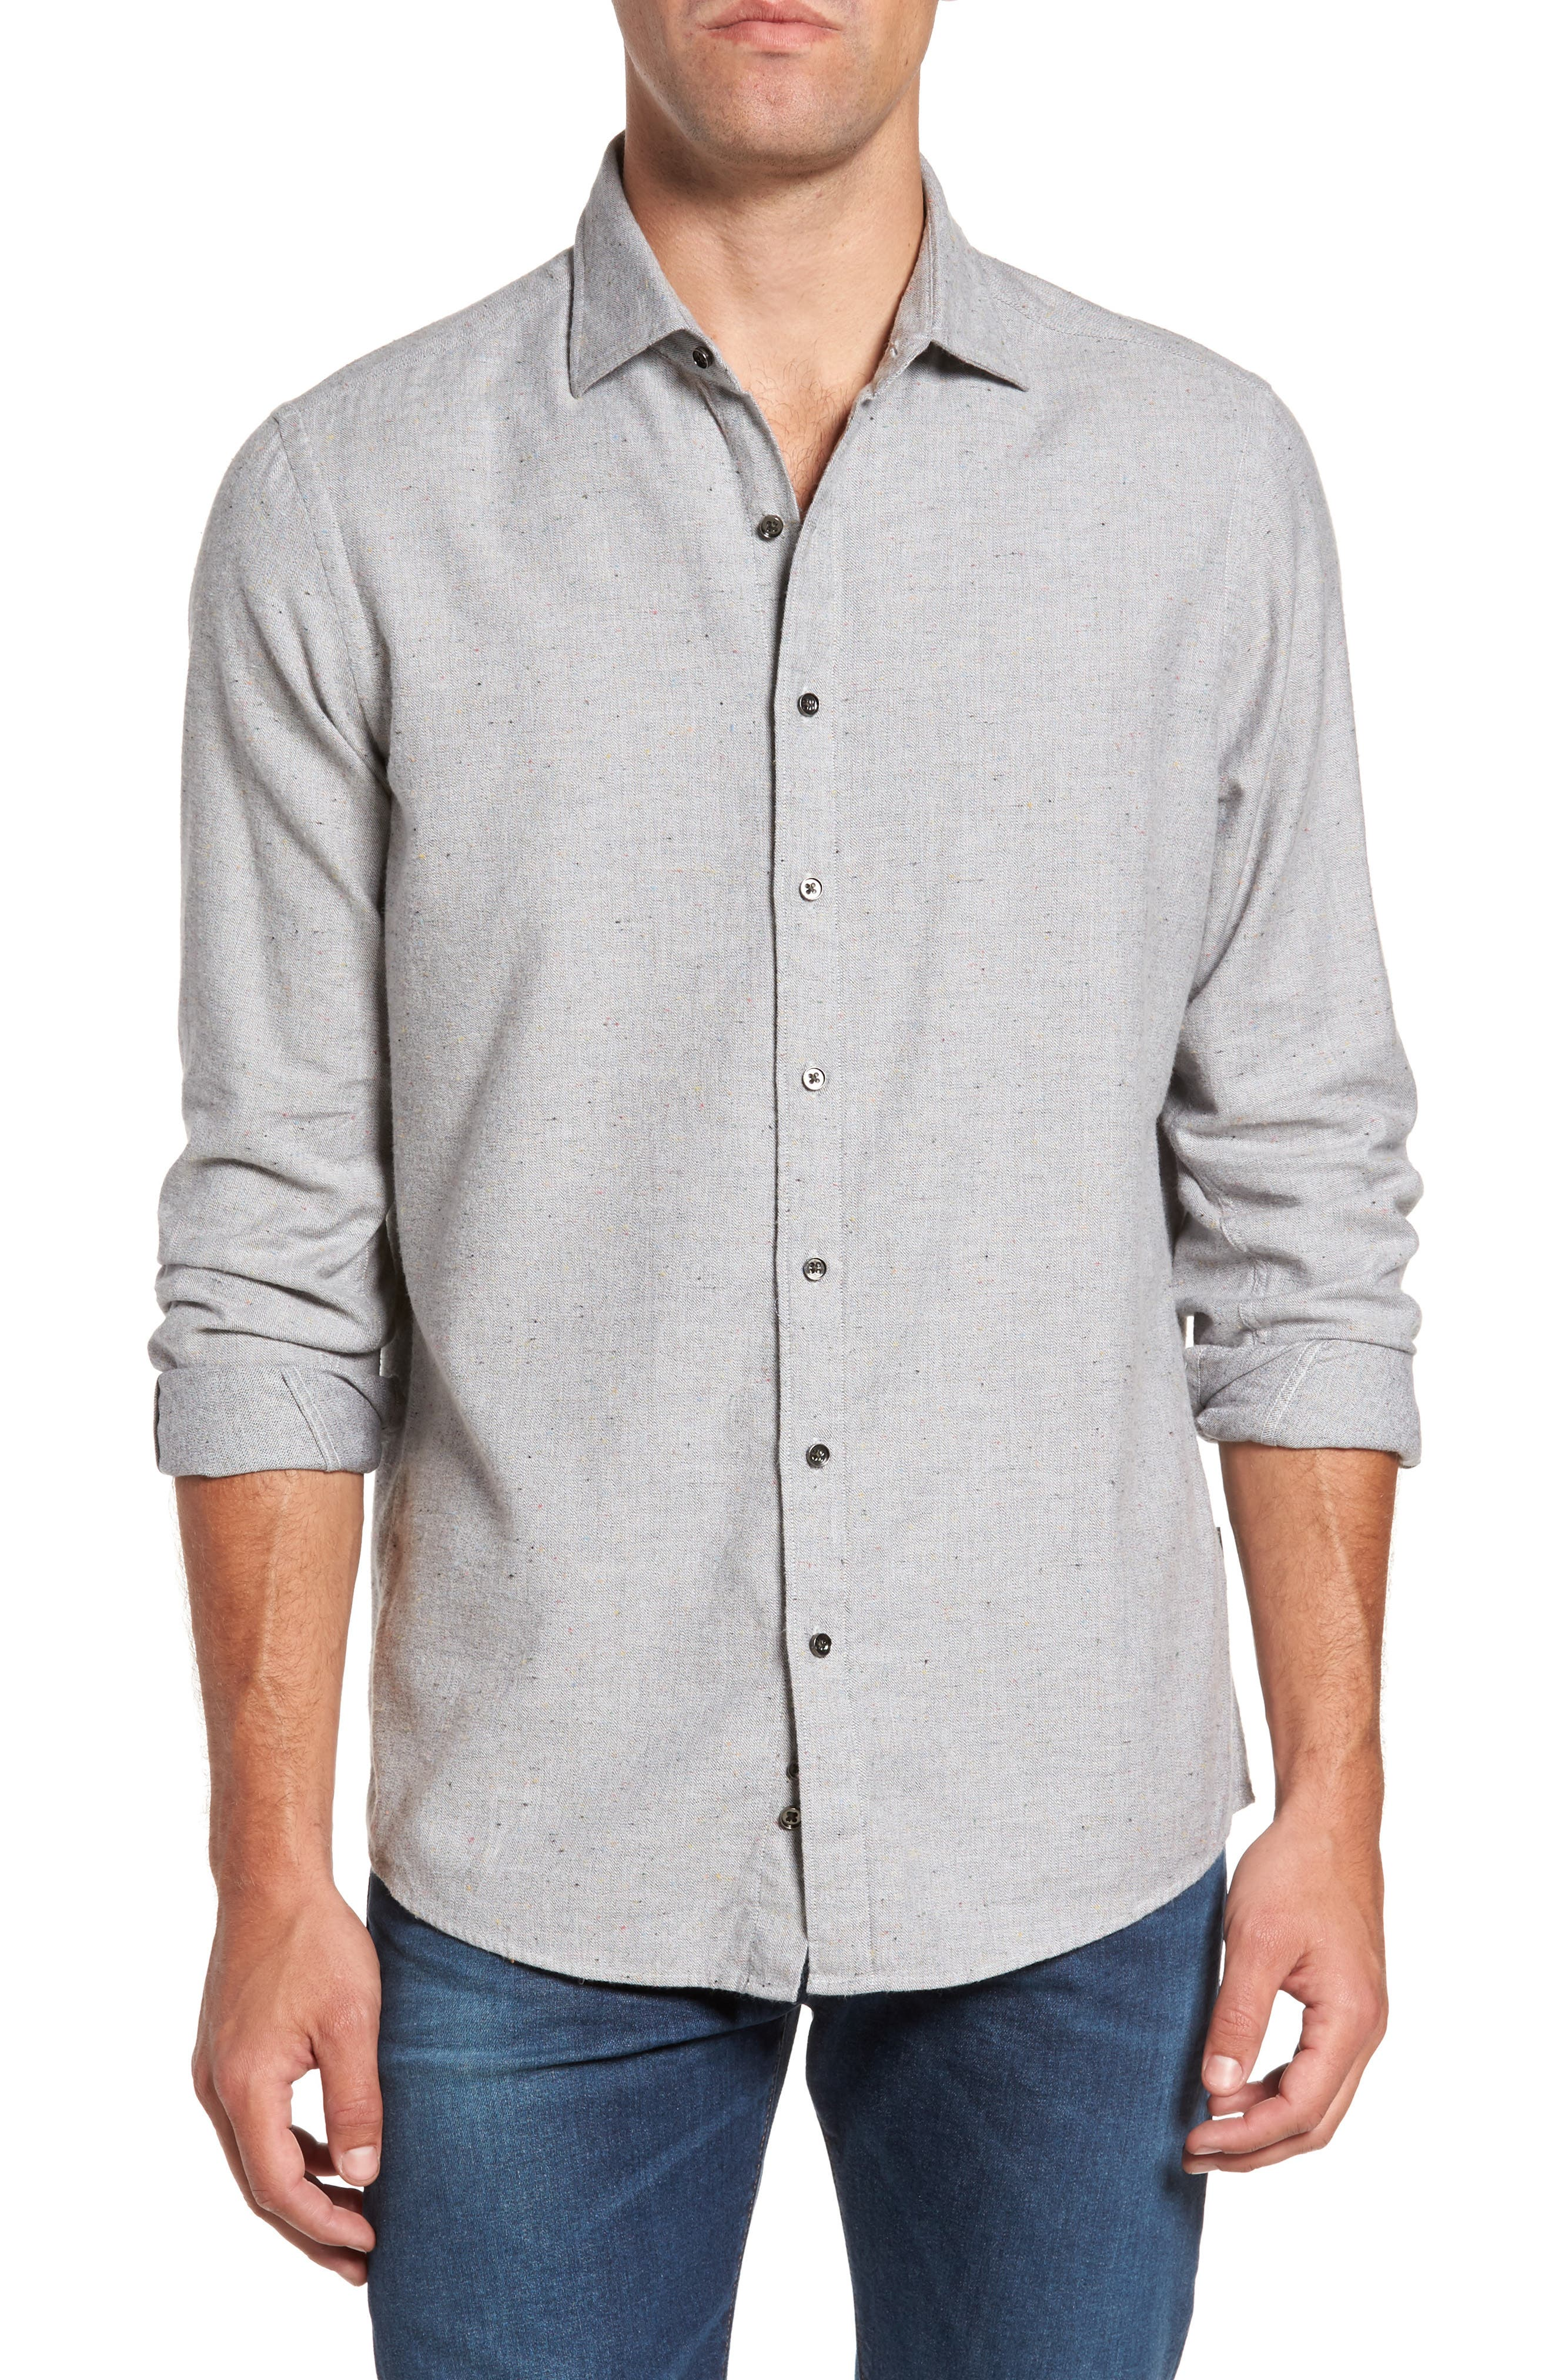 Main Image - Rodd & Gunn Cardwell Nep Flecked Sport Shirt